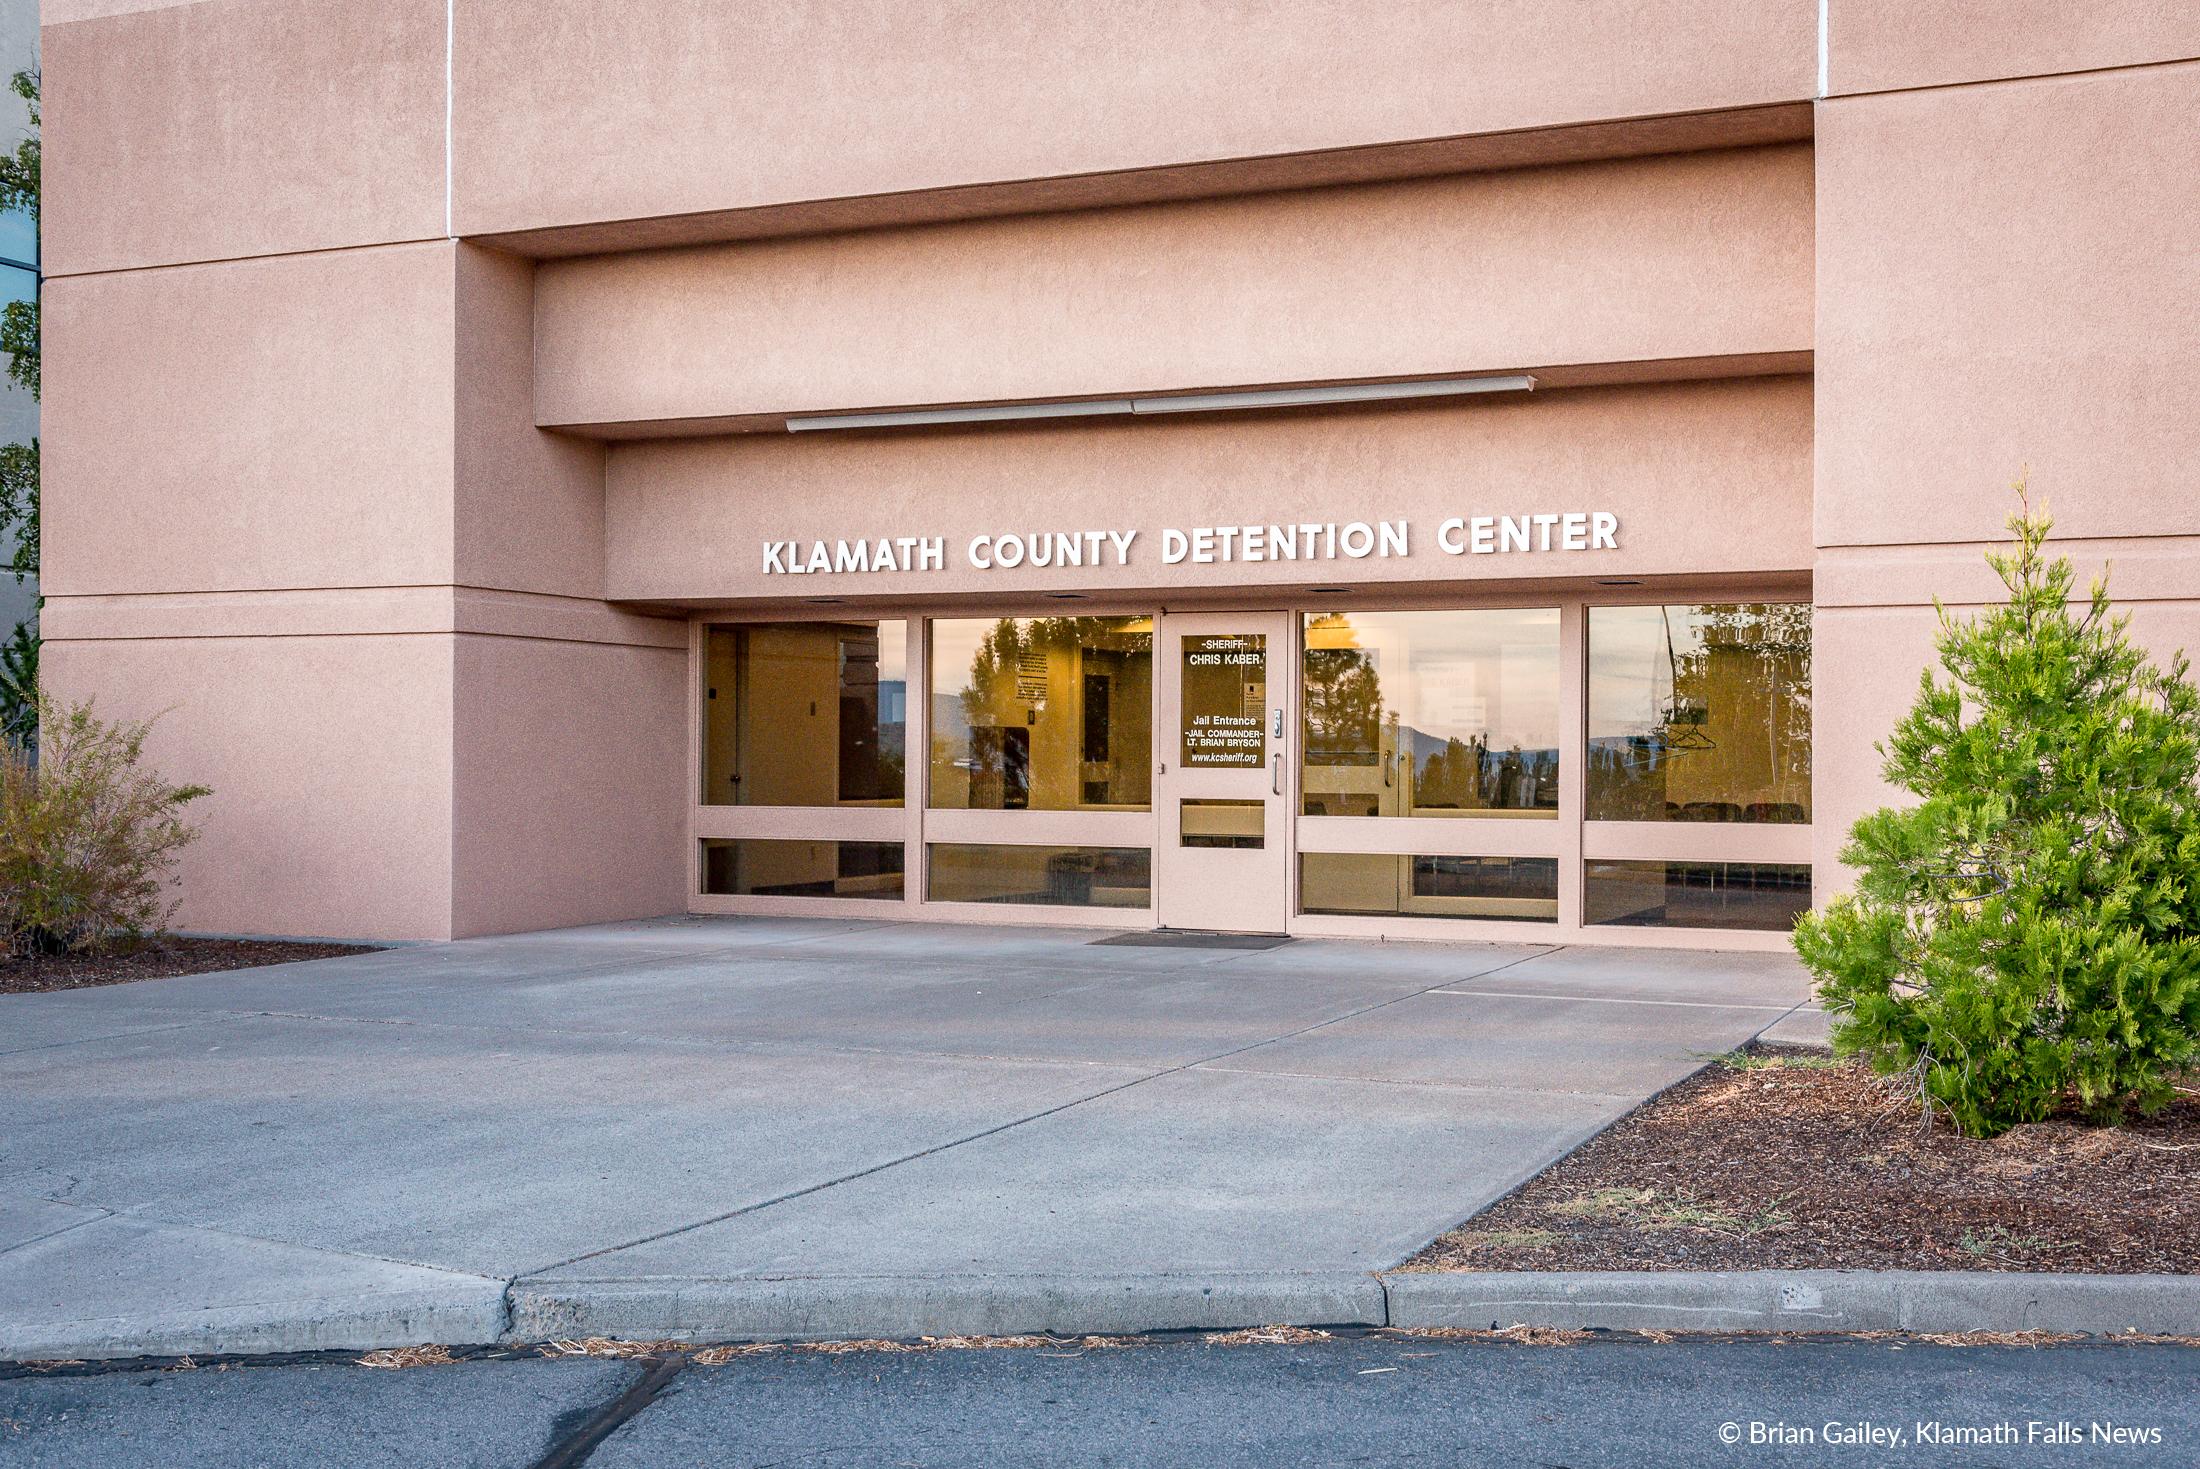 Klamath County Detention Center (Brian Gailey)